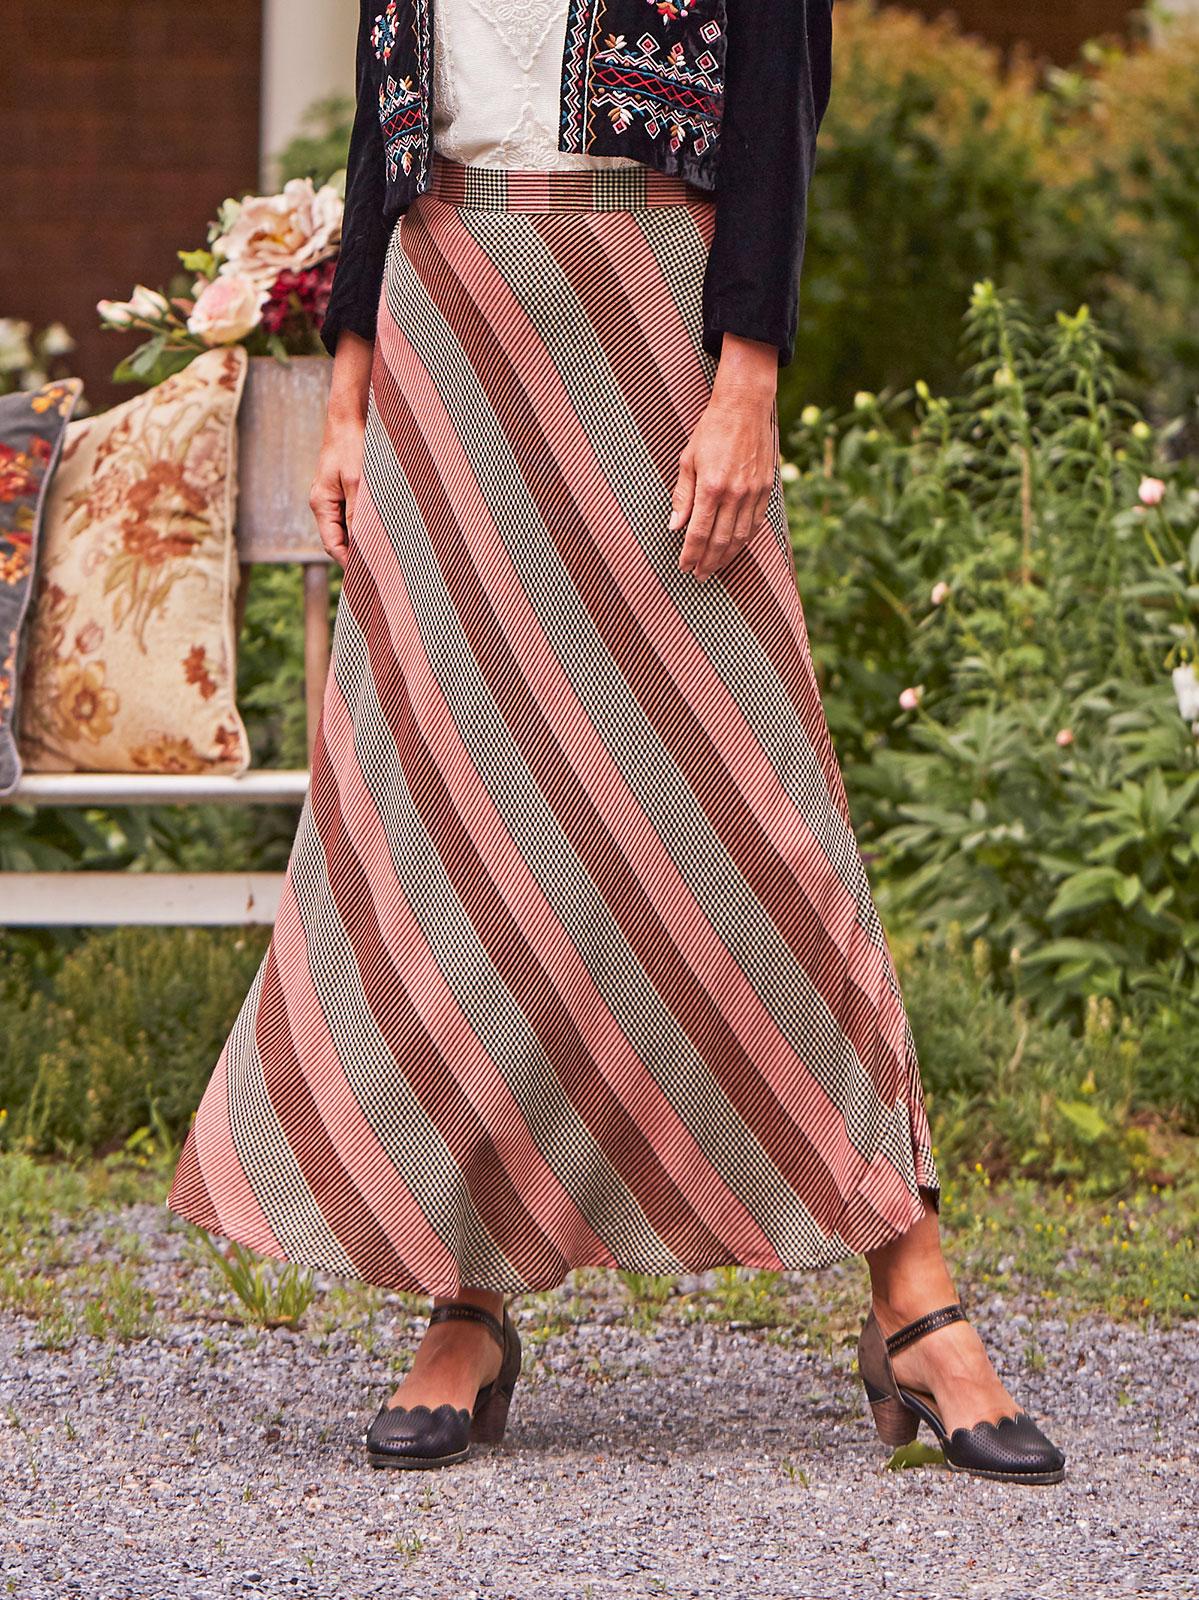 Rosewood Check Skirt